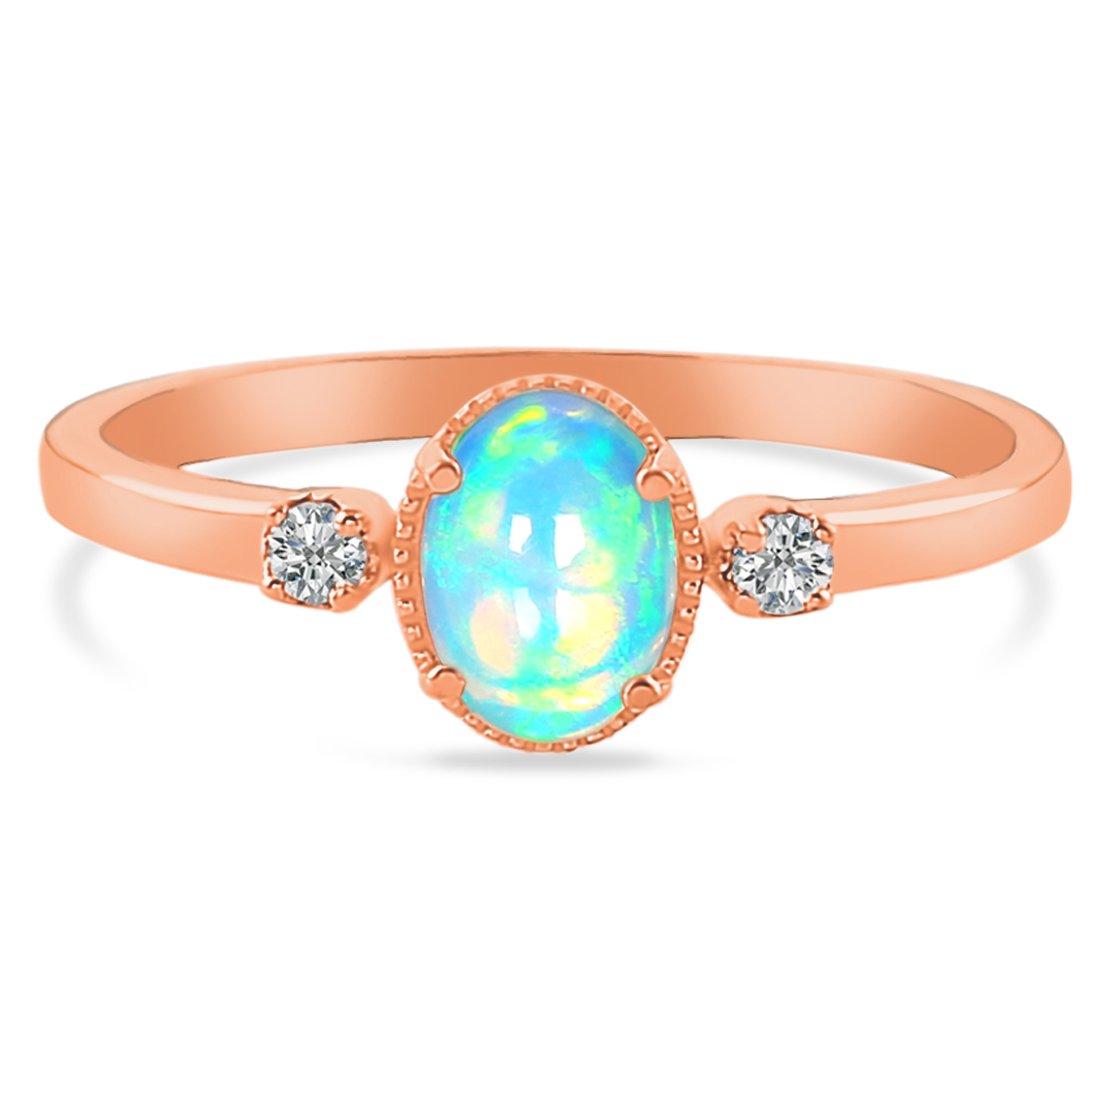 14k Rose Gold Vermeil Opal Ring-Spirit